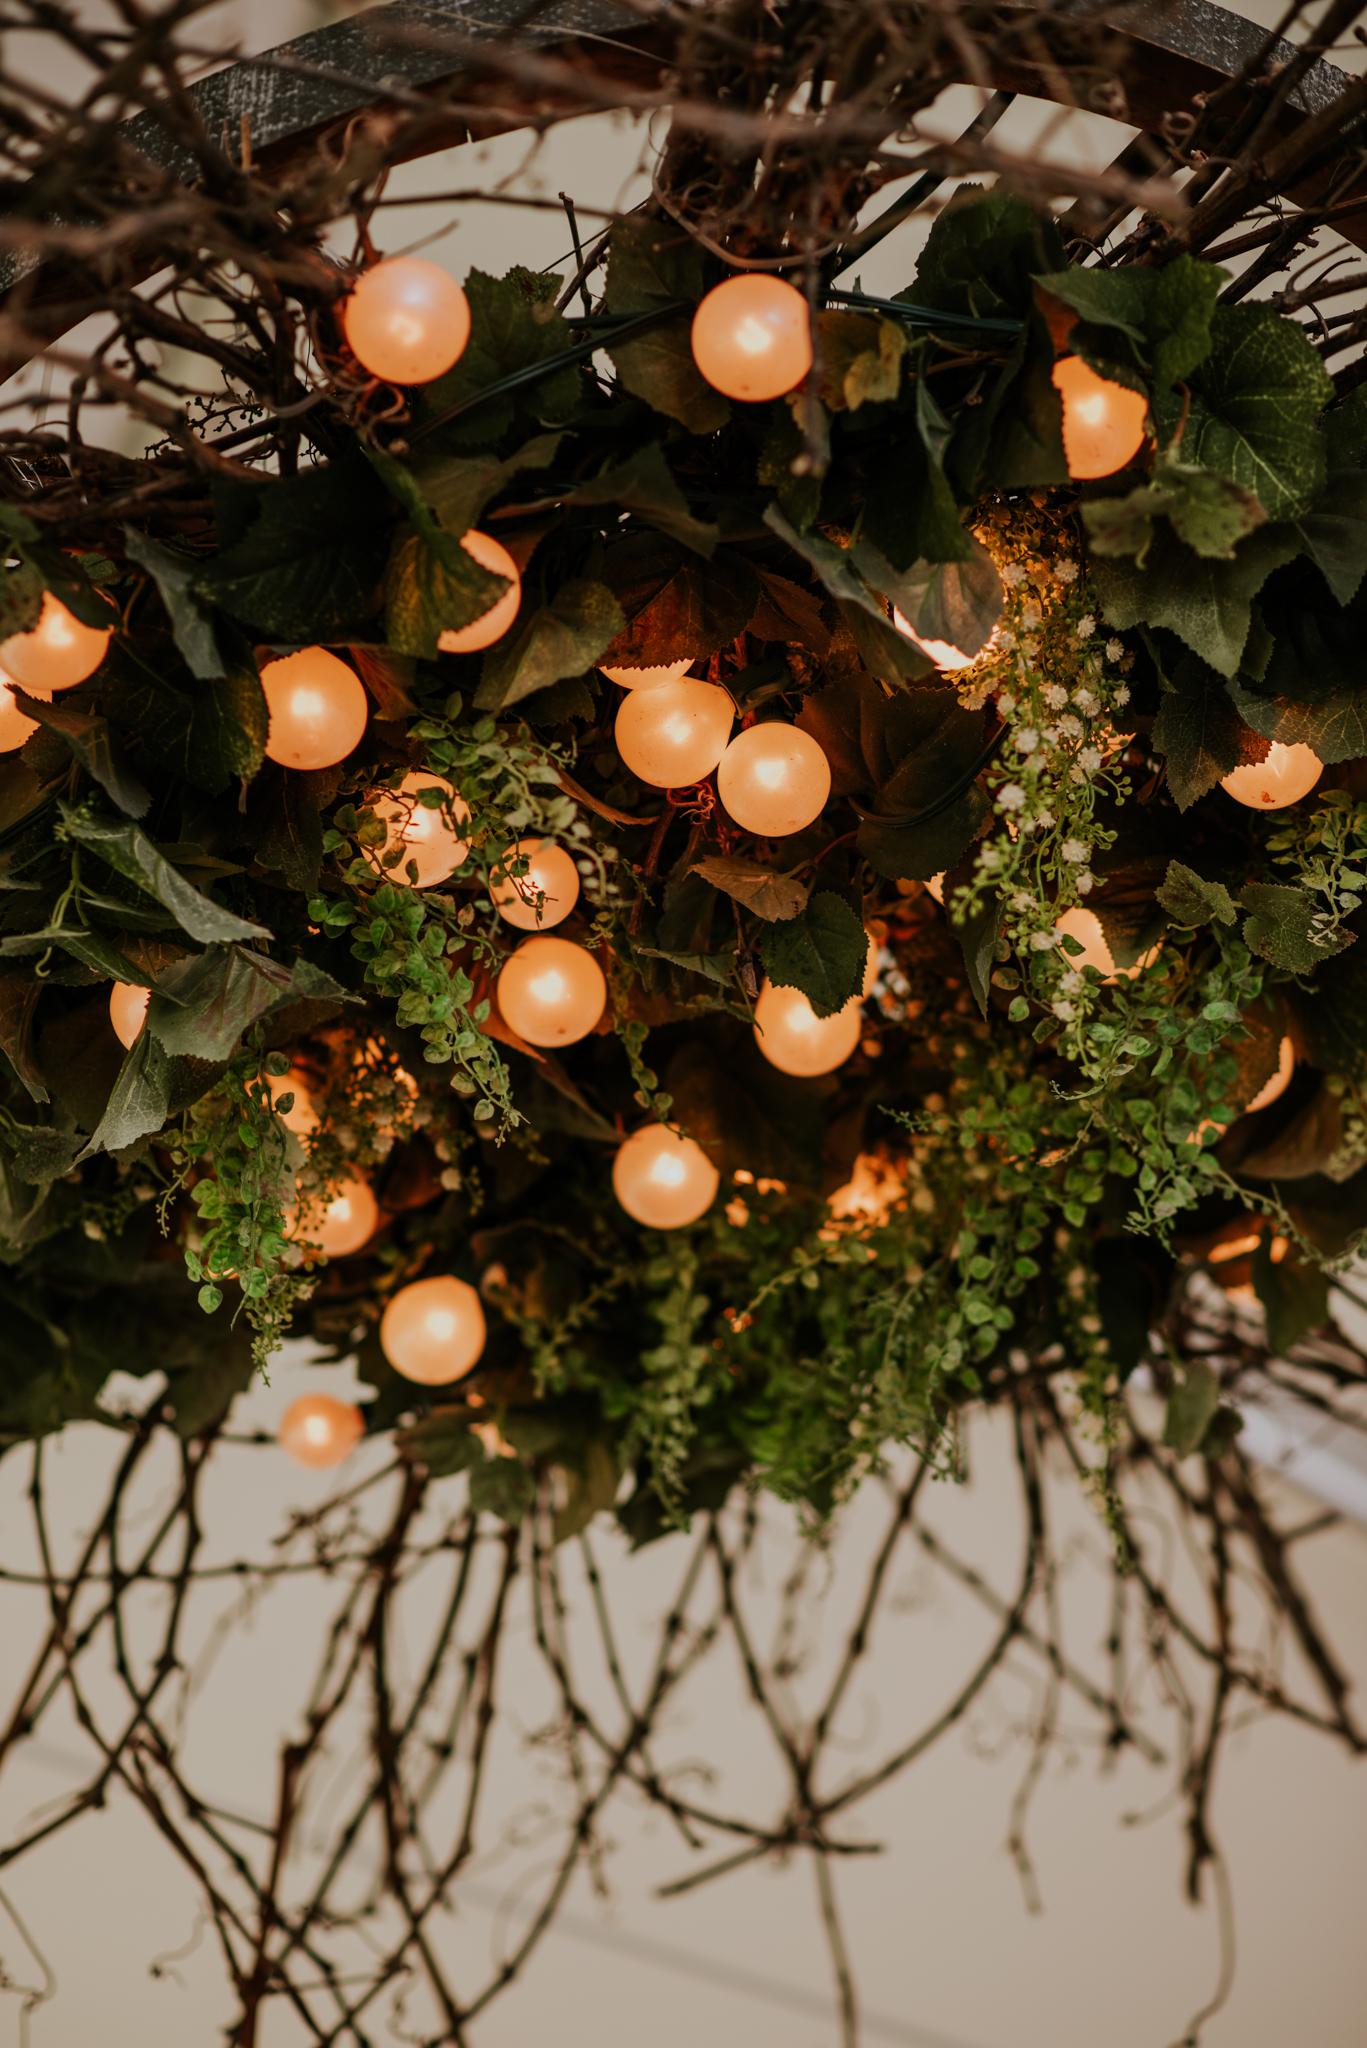 laurenandjarredweddingvendorimagesmisslyssphotographyllccopyright (14 of 229).jpg